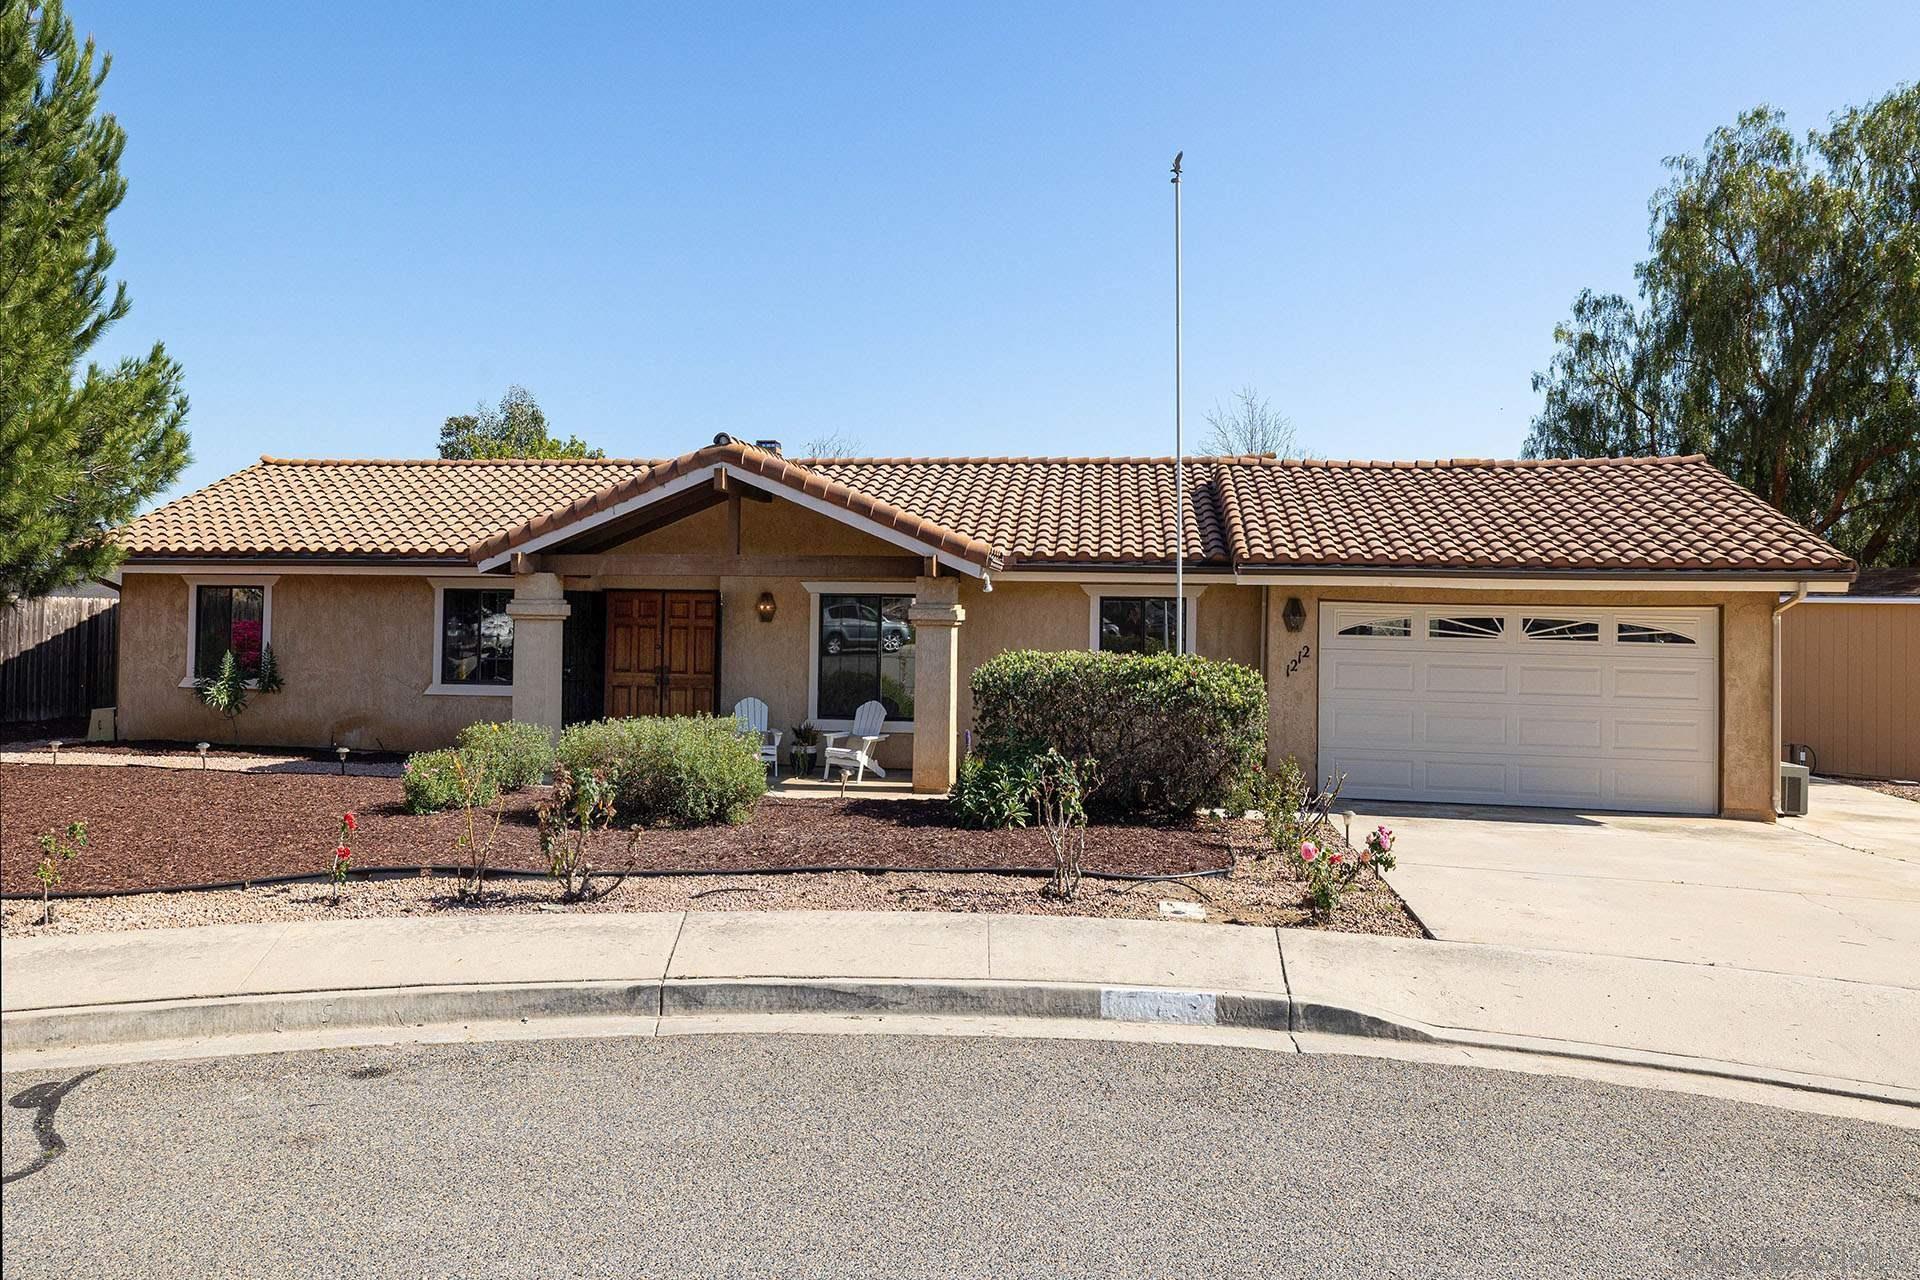 Photo of 1212 Anna Lane, San Marcos, CA 92069 (MLS # 210009088)